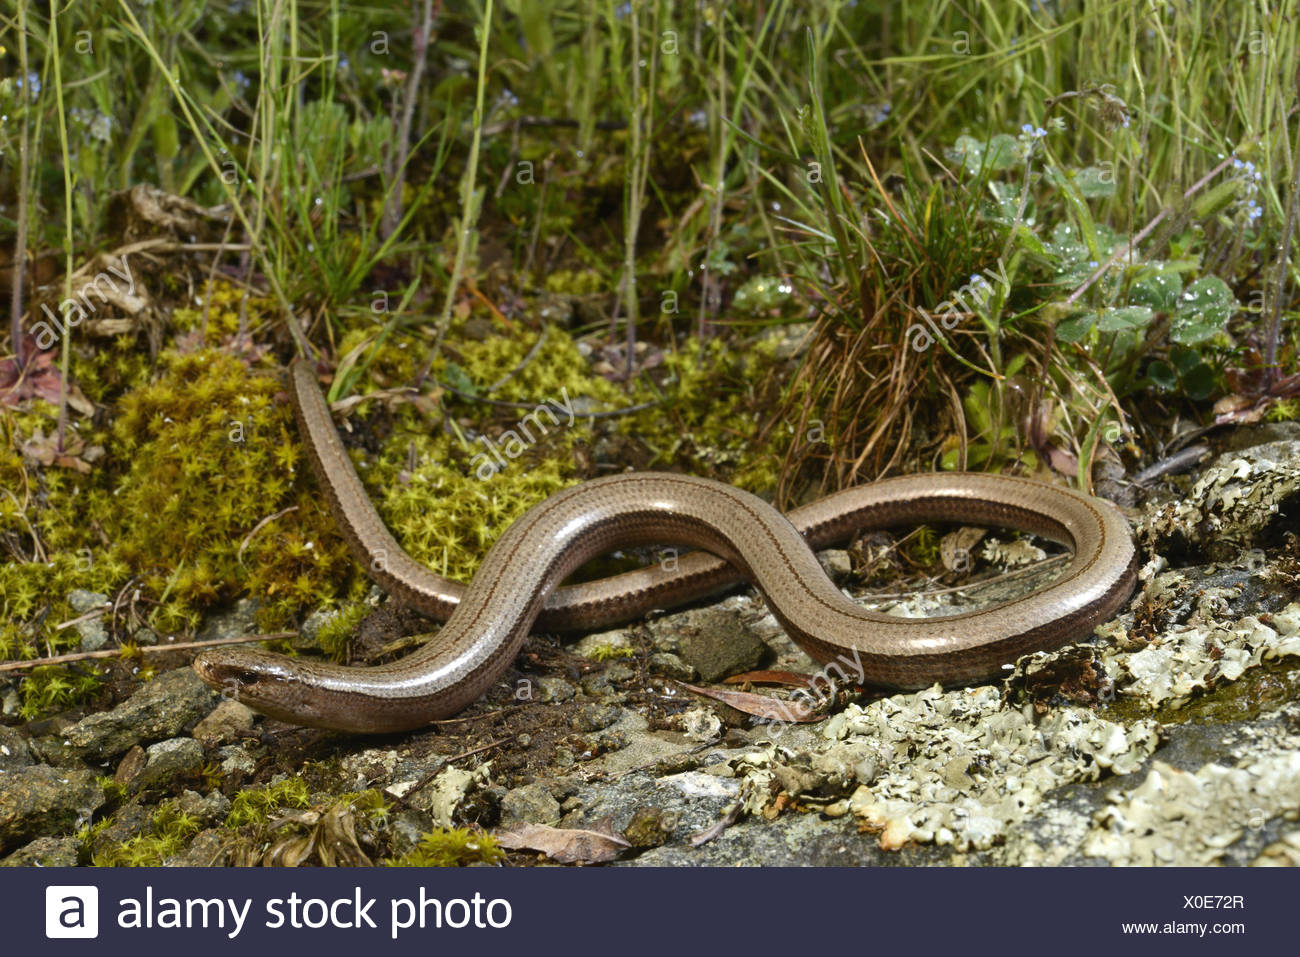 Eastern slow worm, blindworm, slow worm (Anguis fragilis colchica, Anguis colchica), female winding on the ground, Bulgaria, Biosphaerenreservat Ropotamo Stock Photo